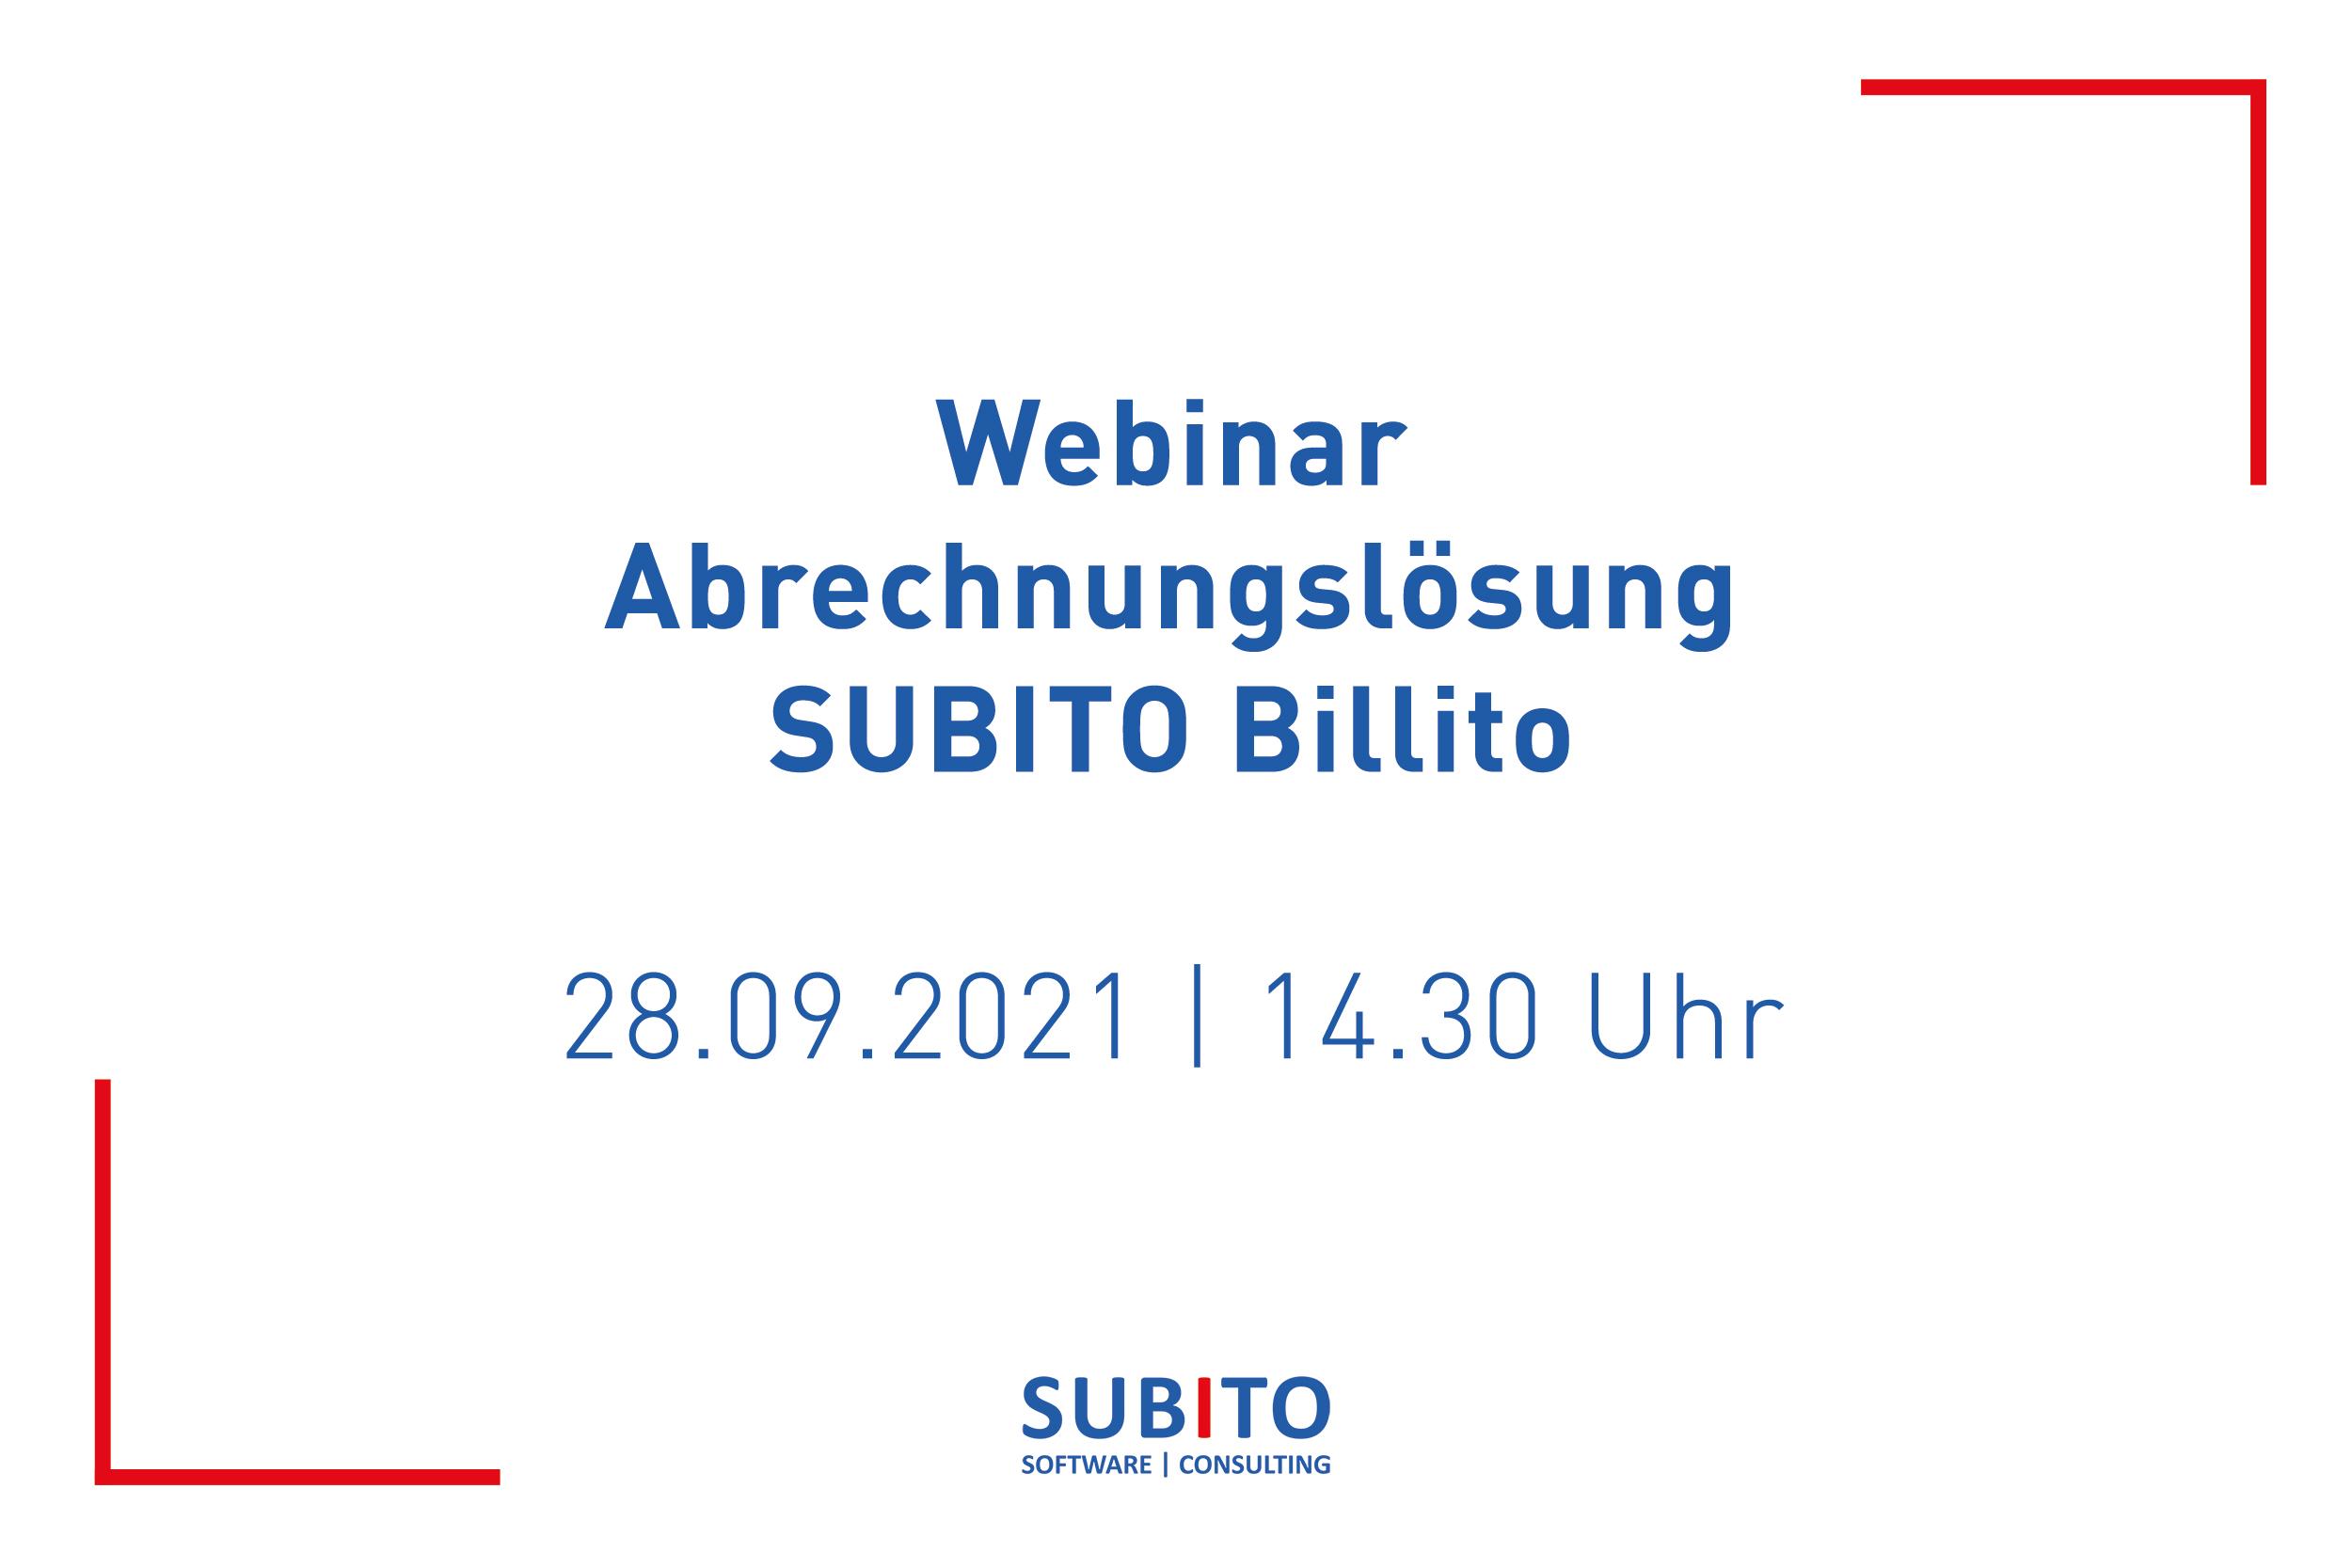 Live-Webinar zu SUBITO Billito am 28.09.2021